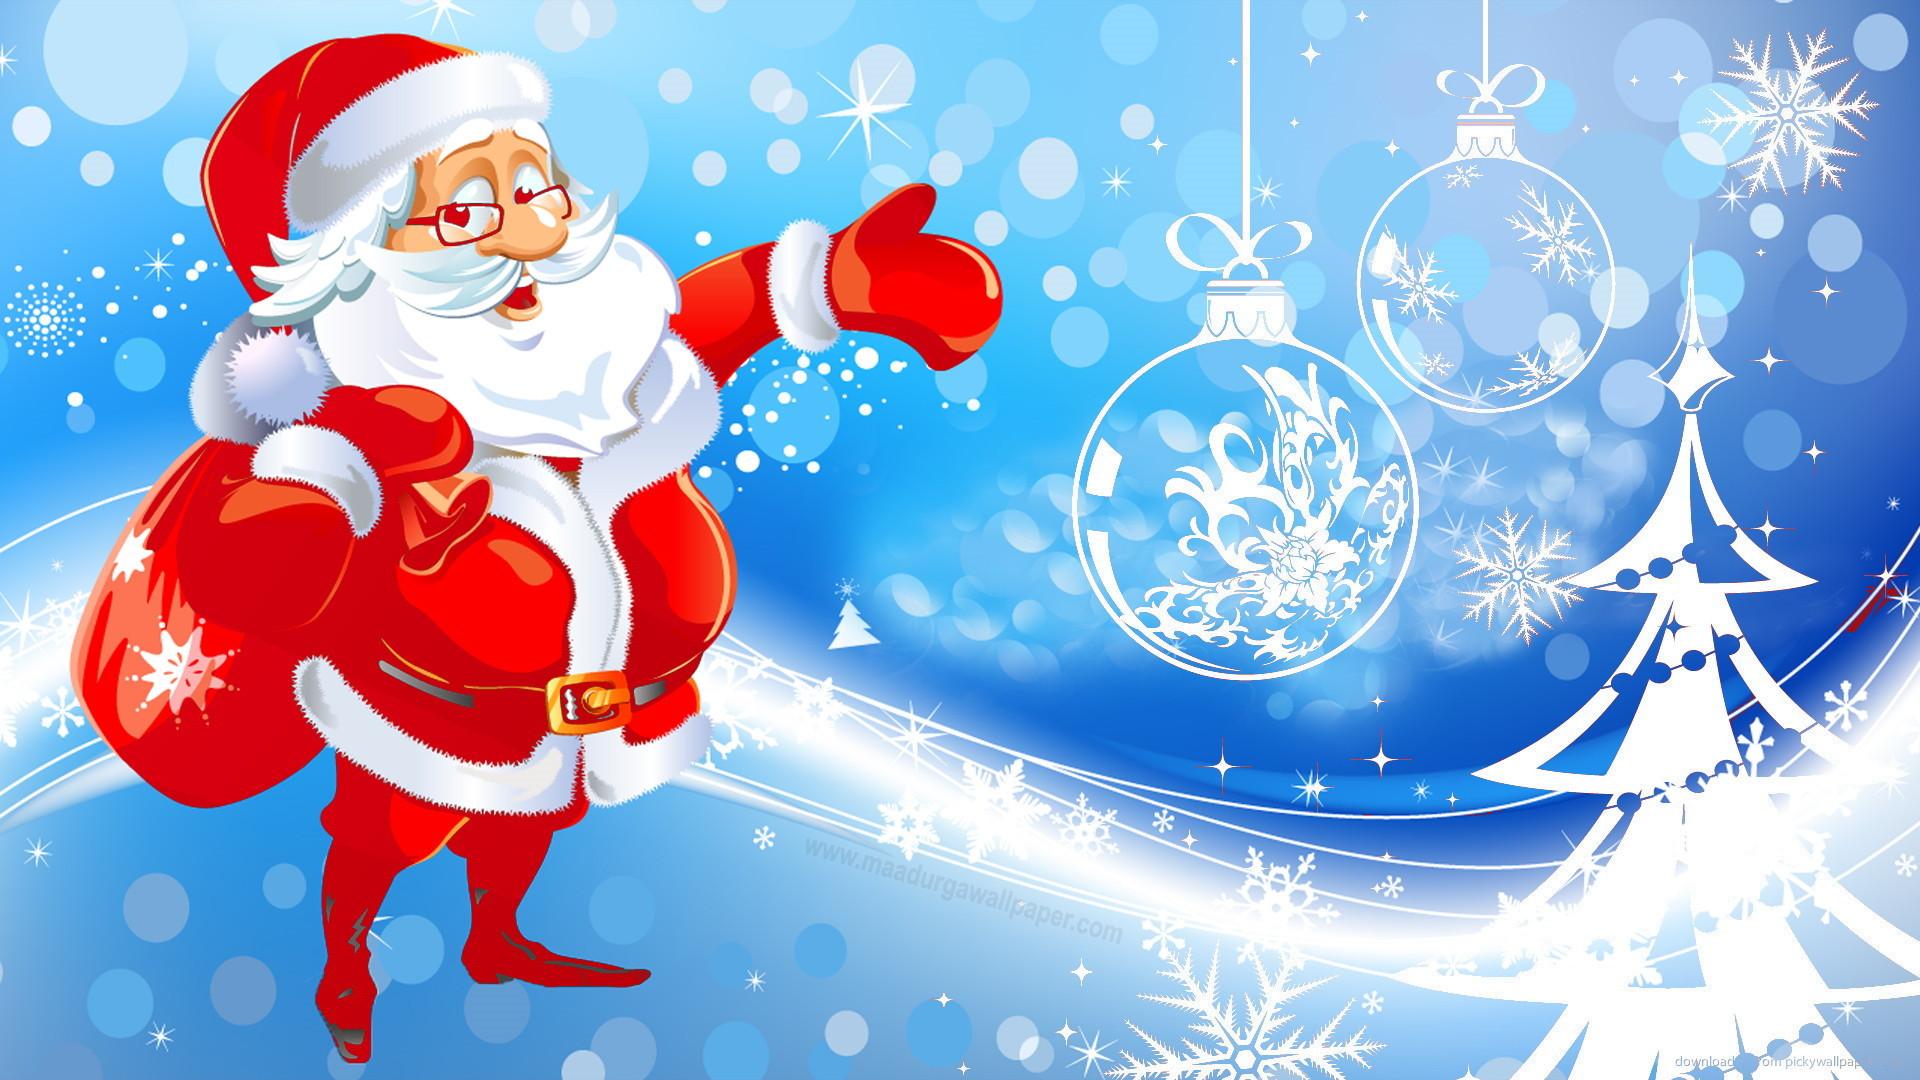 HD Christmas Santa